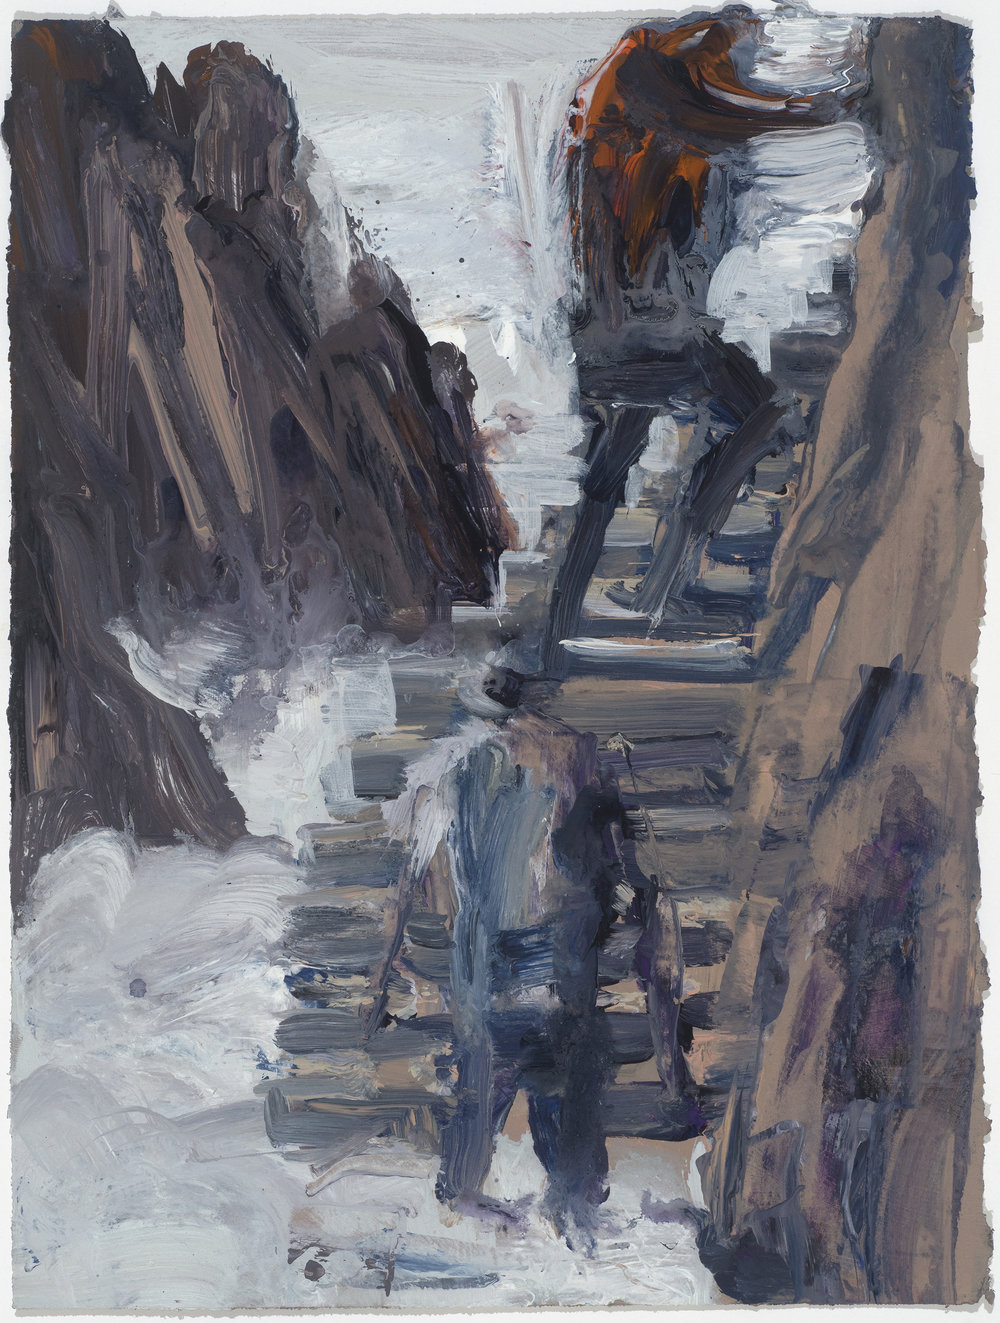 Stairs & mist study  樓梯與霧考察10/16   Euan Macleod , 2016  Acrylic on paper, 38 x 29 cm, HKD 9,800 framed